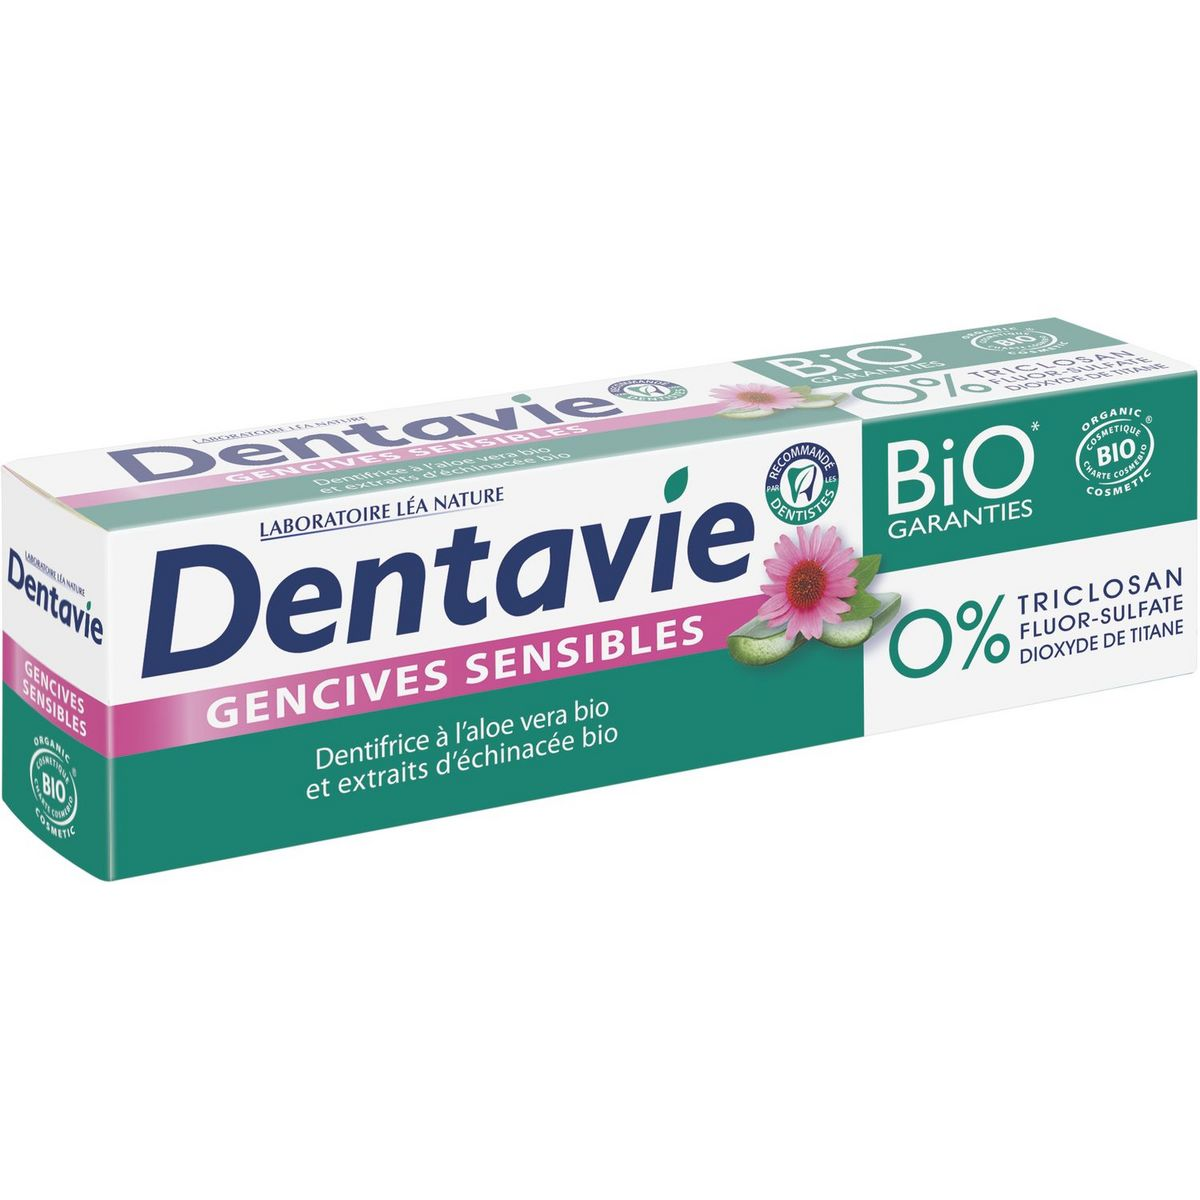 Dentavie Dentifrice gencives sensibles aloe vera & échinacée bio 75ml